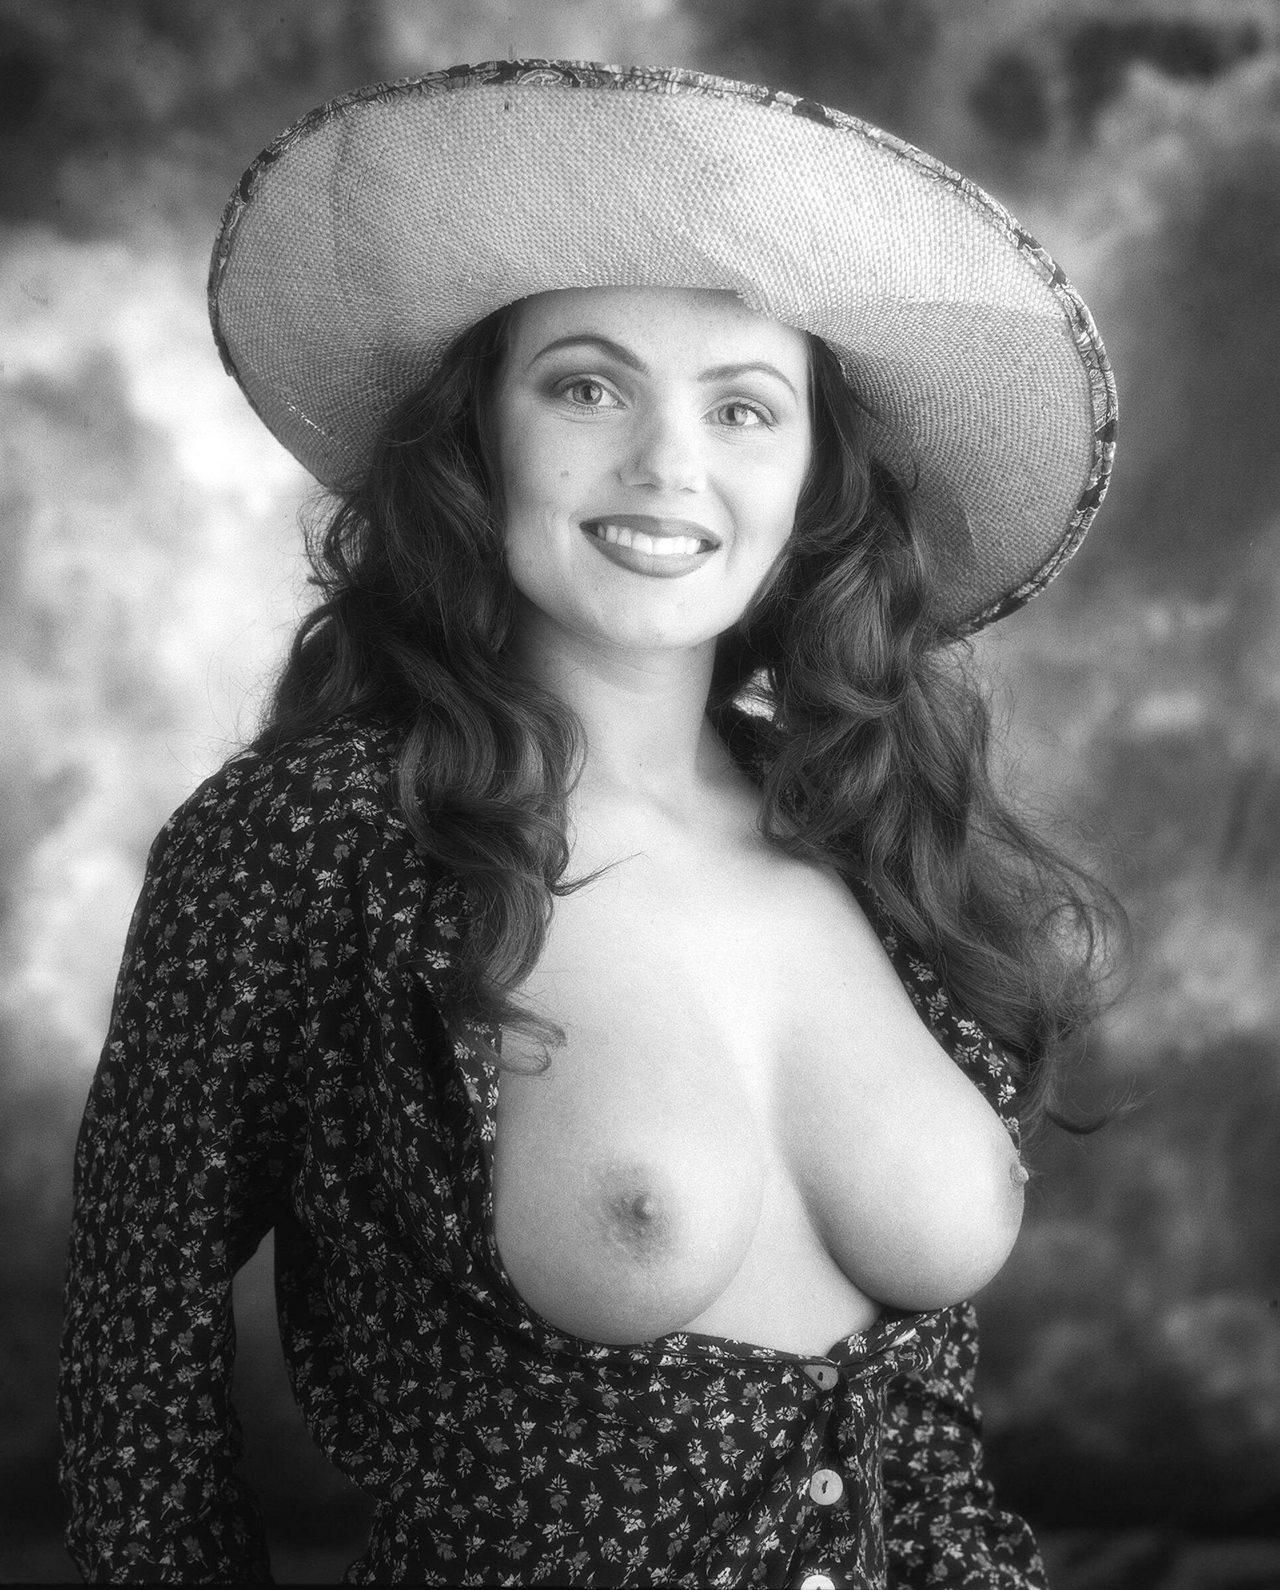 Geri Halliwell Nude Pics geri halliwell topless in a hat black-&-white photo